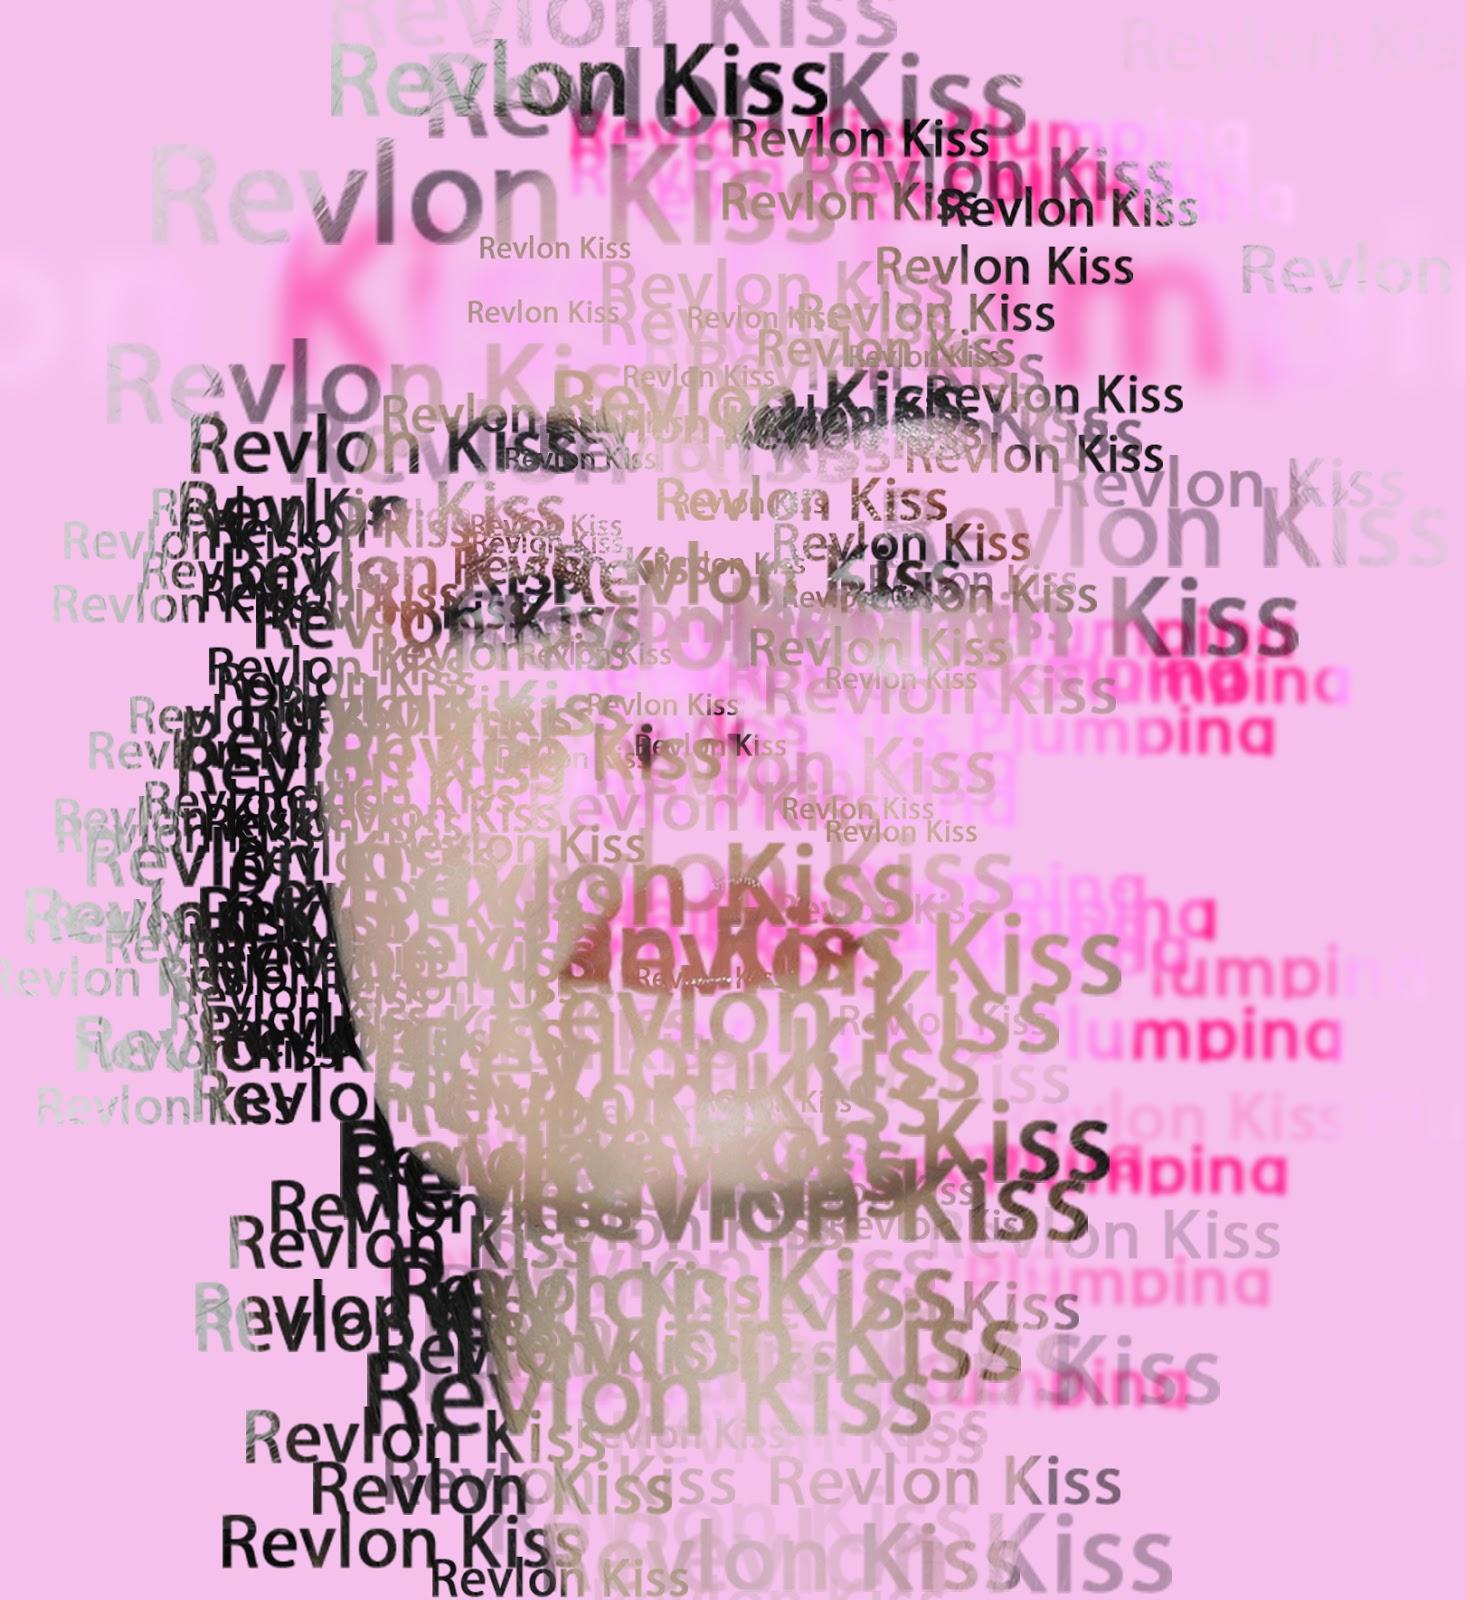 Revlon Kiss